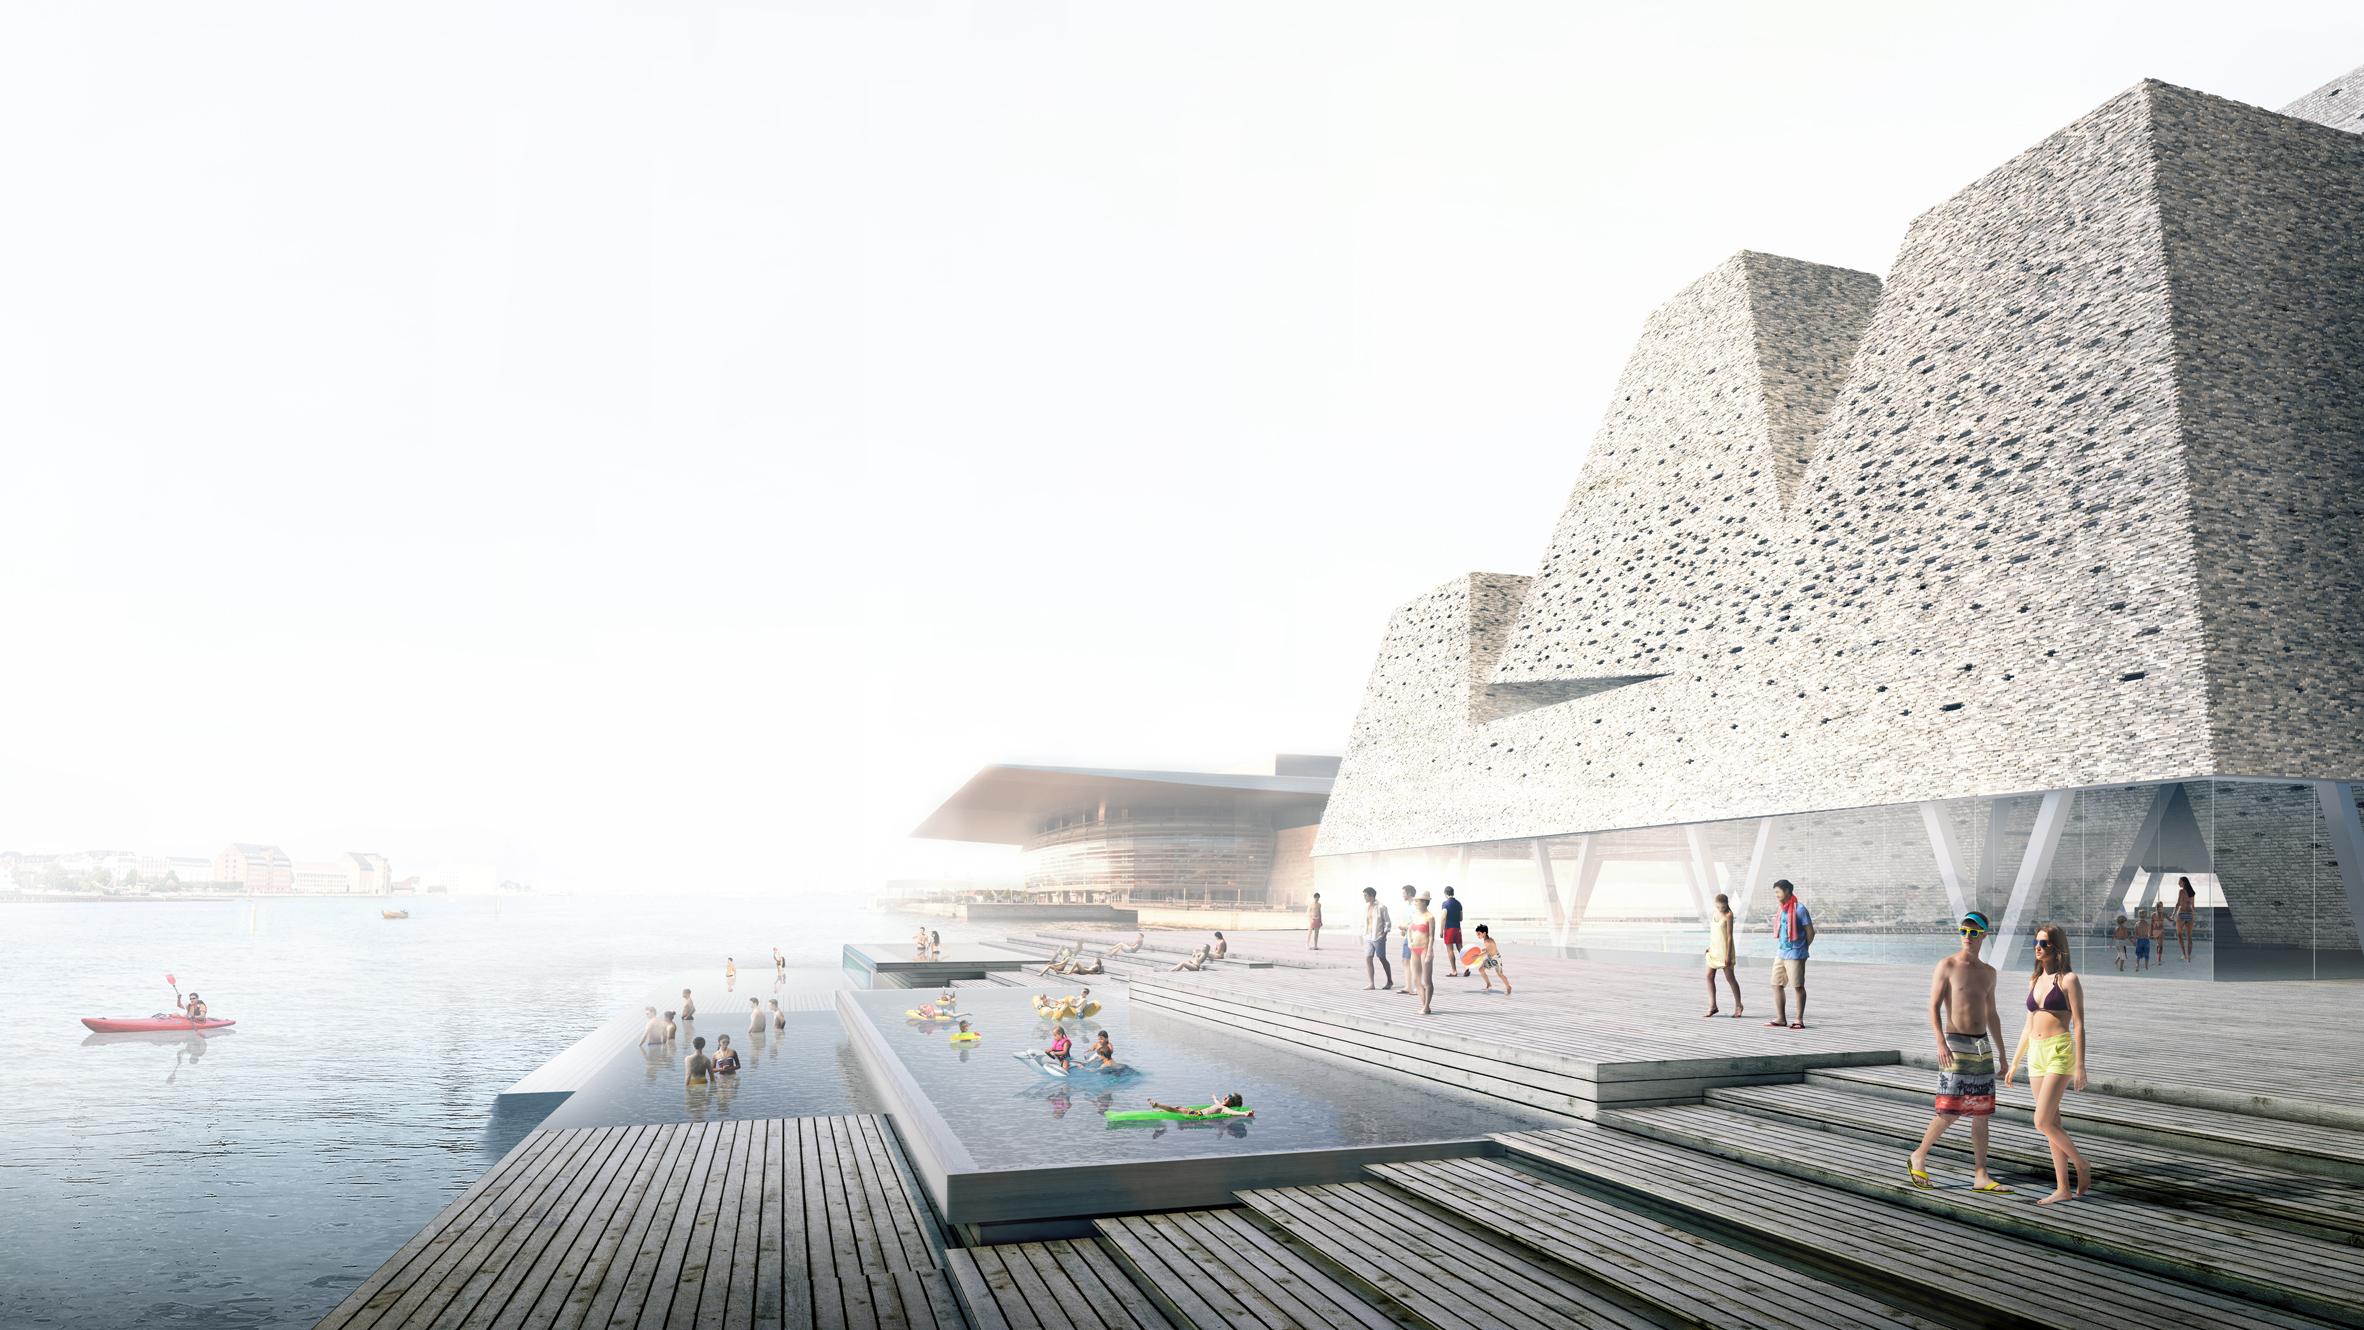 kengo-kuma-waterfront-cultural-centre-dezeen-2364-hero.jpg